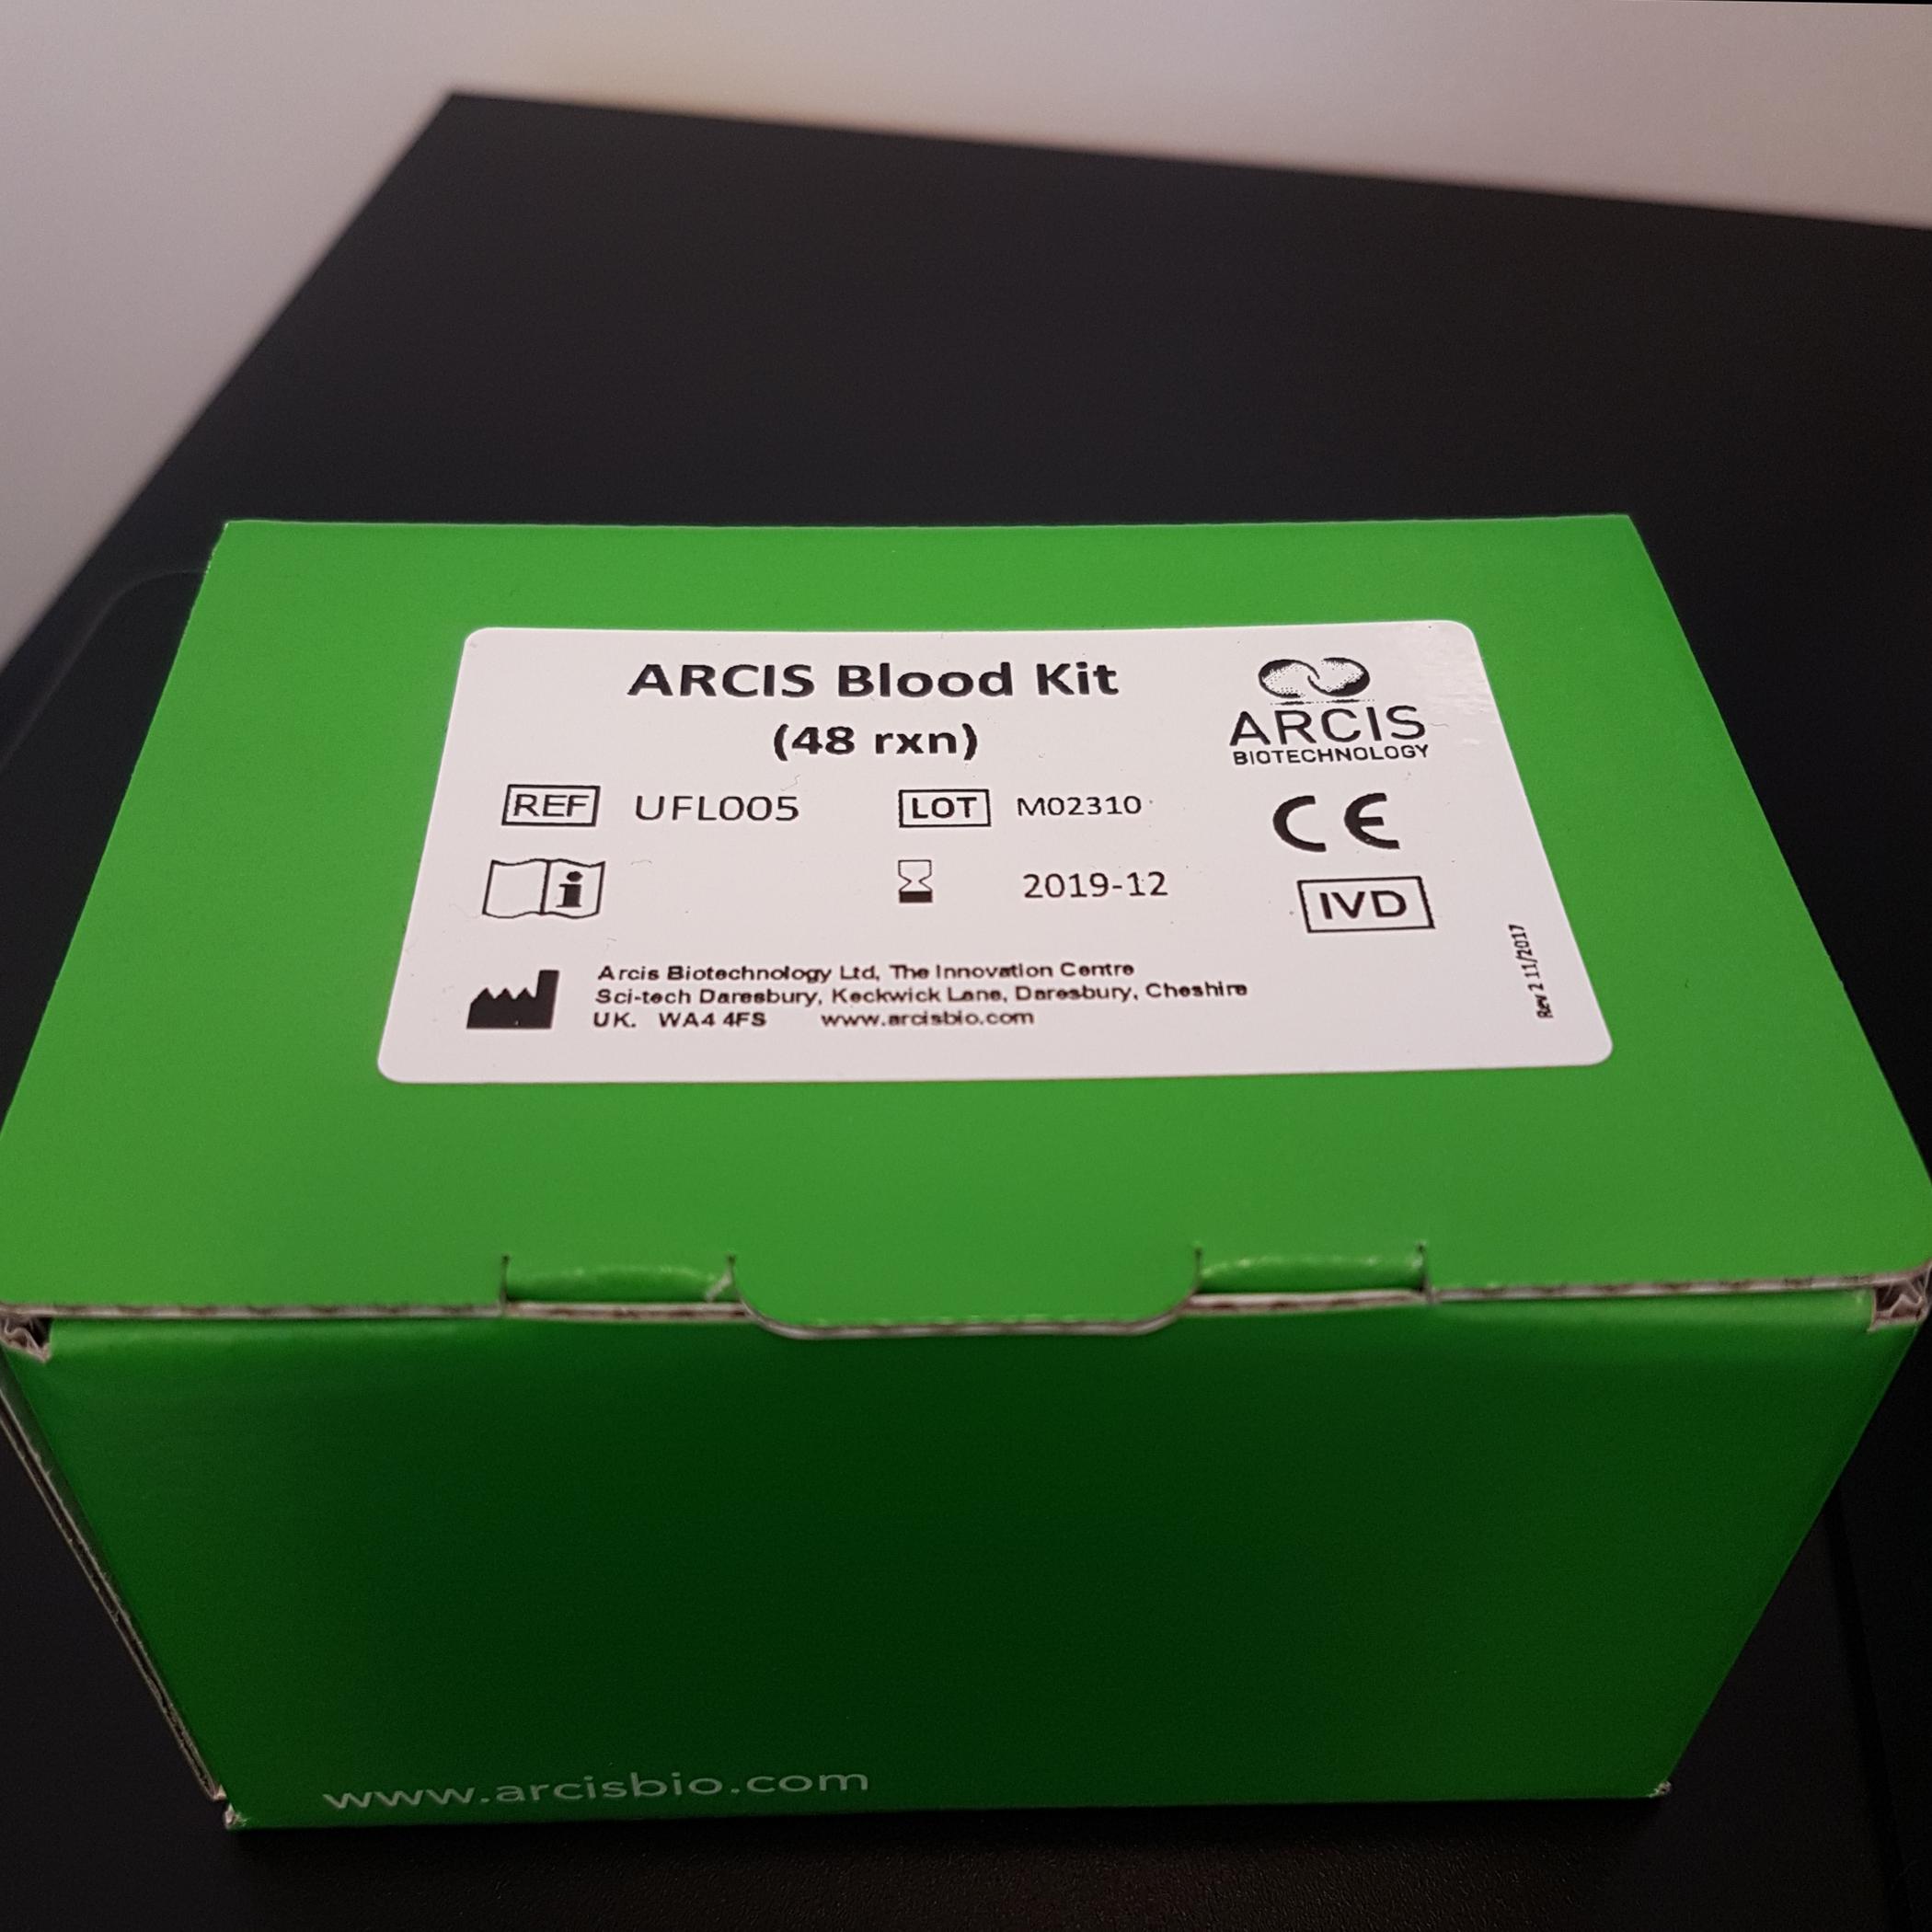 Arcis Blood Kit CE-IVD